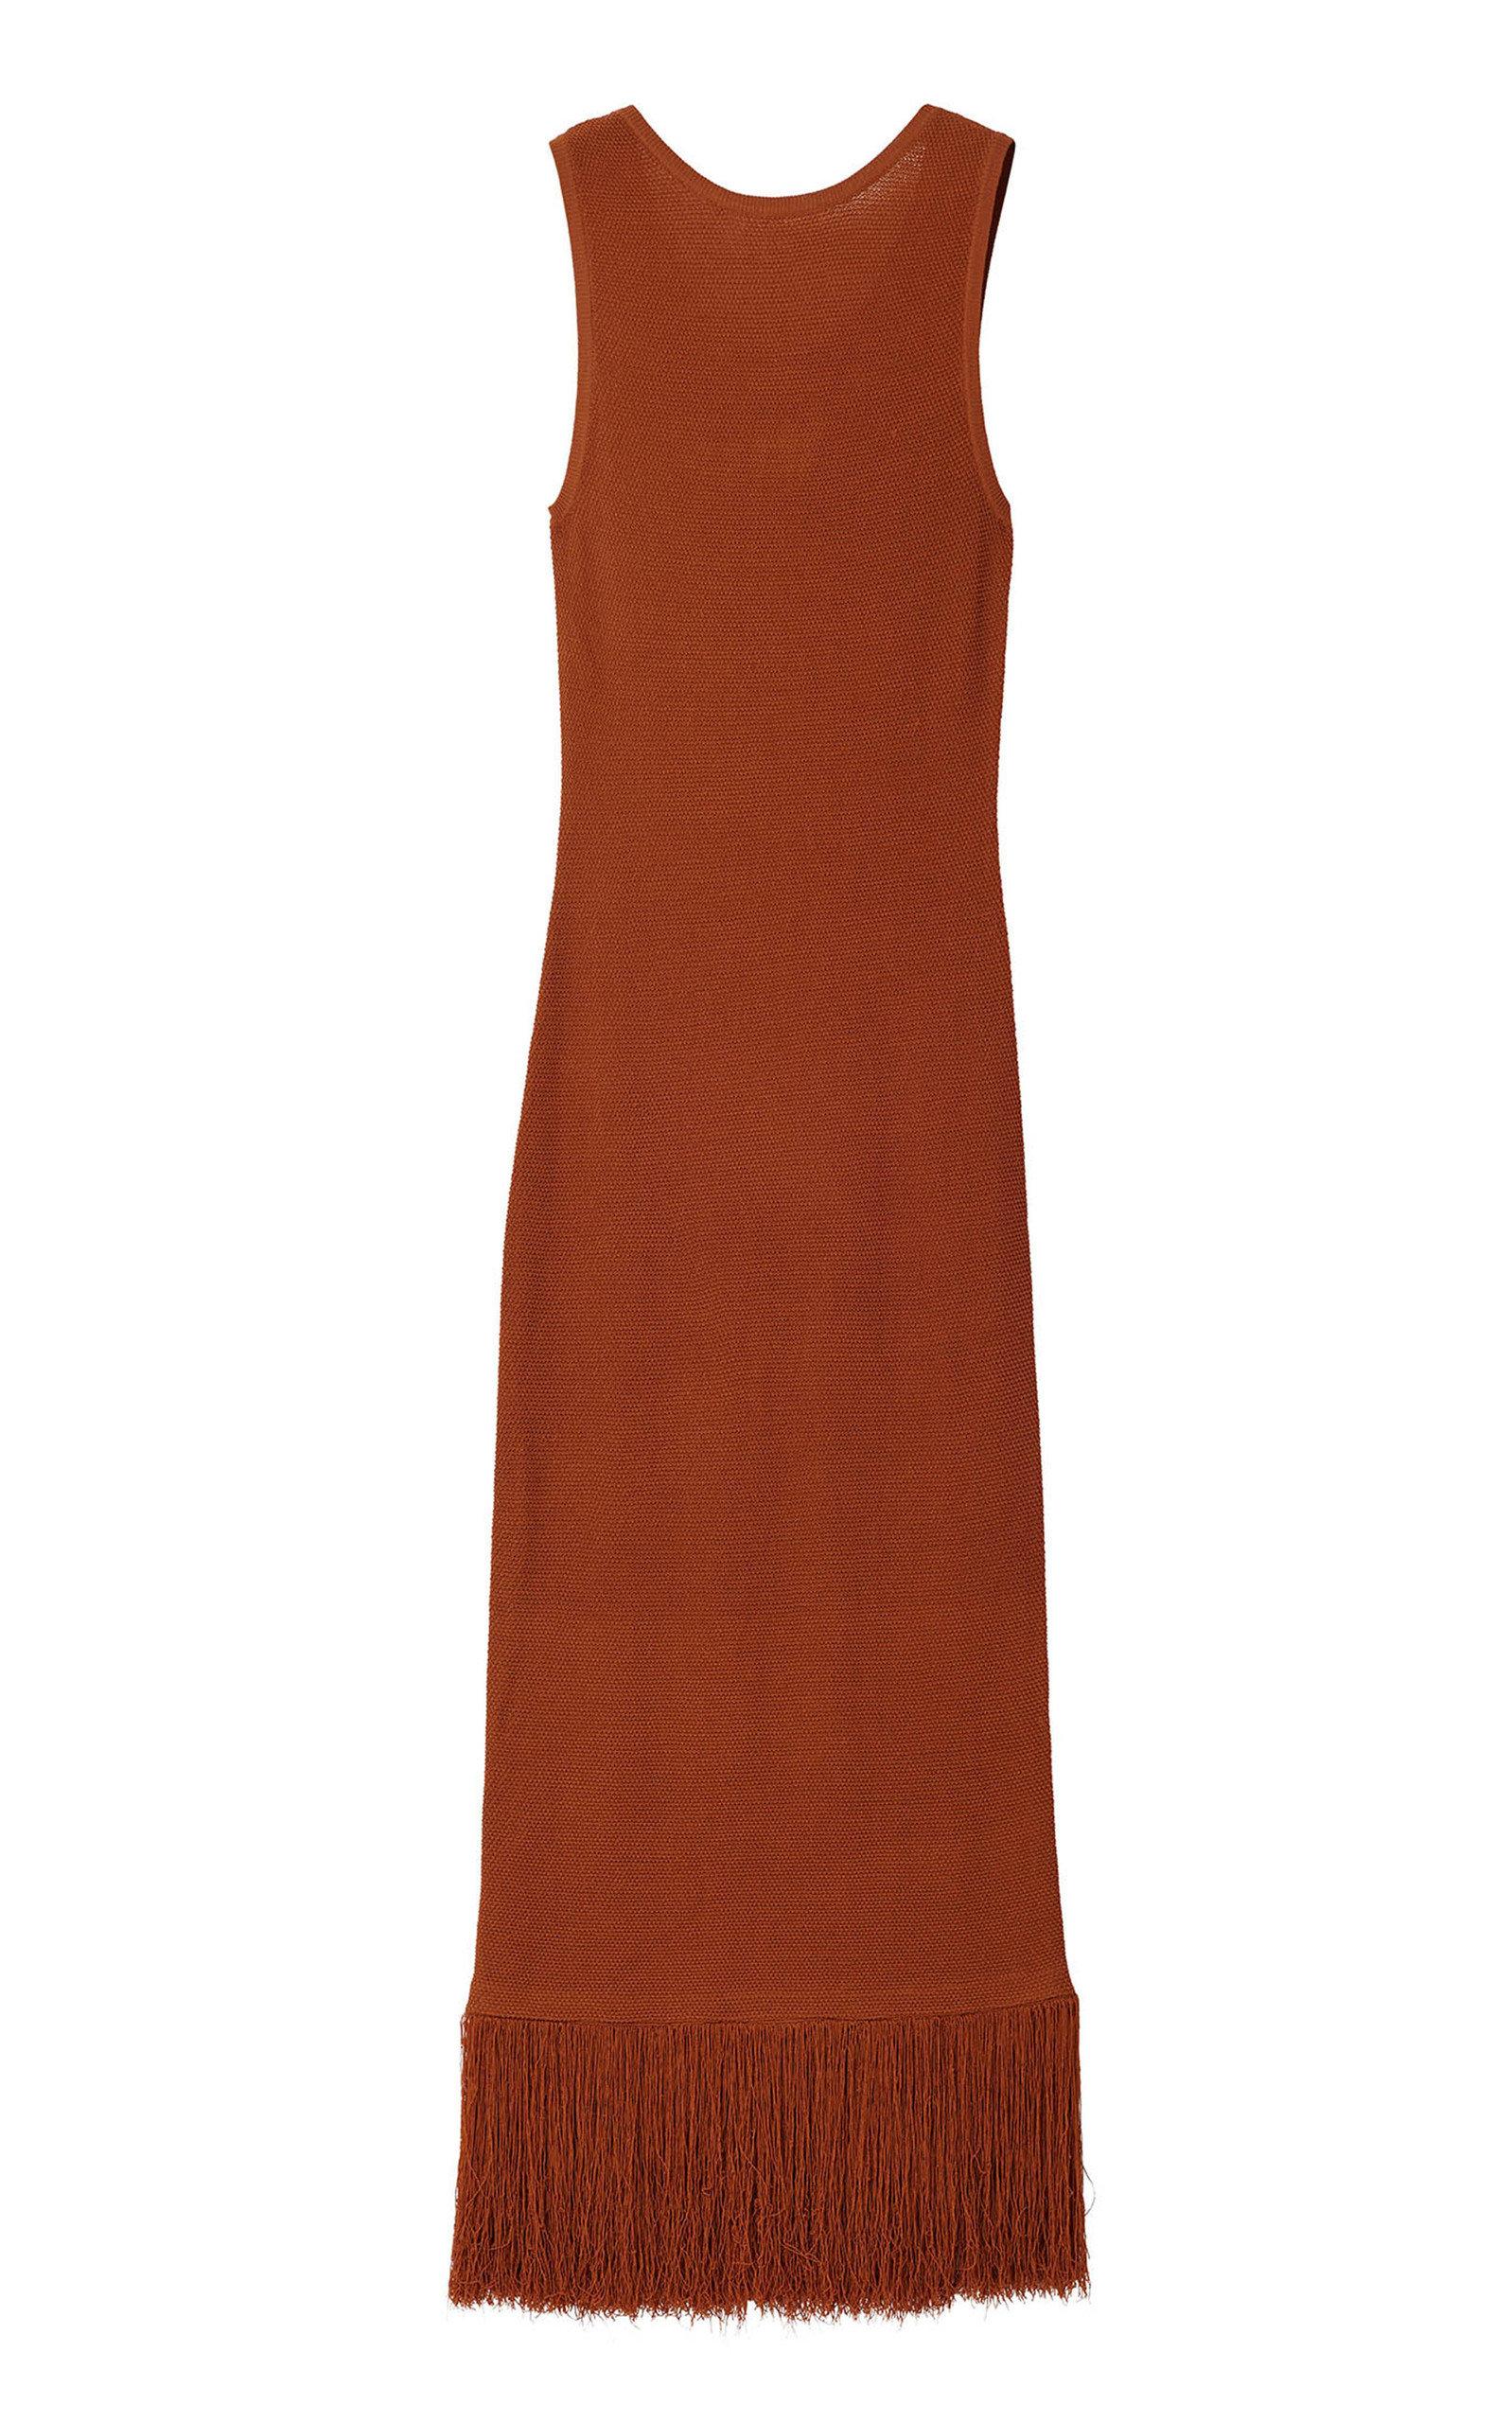 Buy Rodebjer Etthara Sleeveless Maxi Dress online, shop Rodebjer at the best price